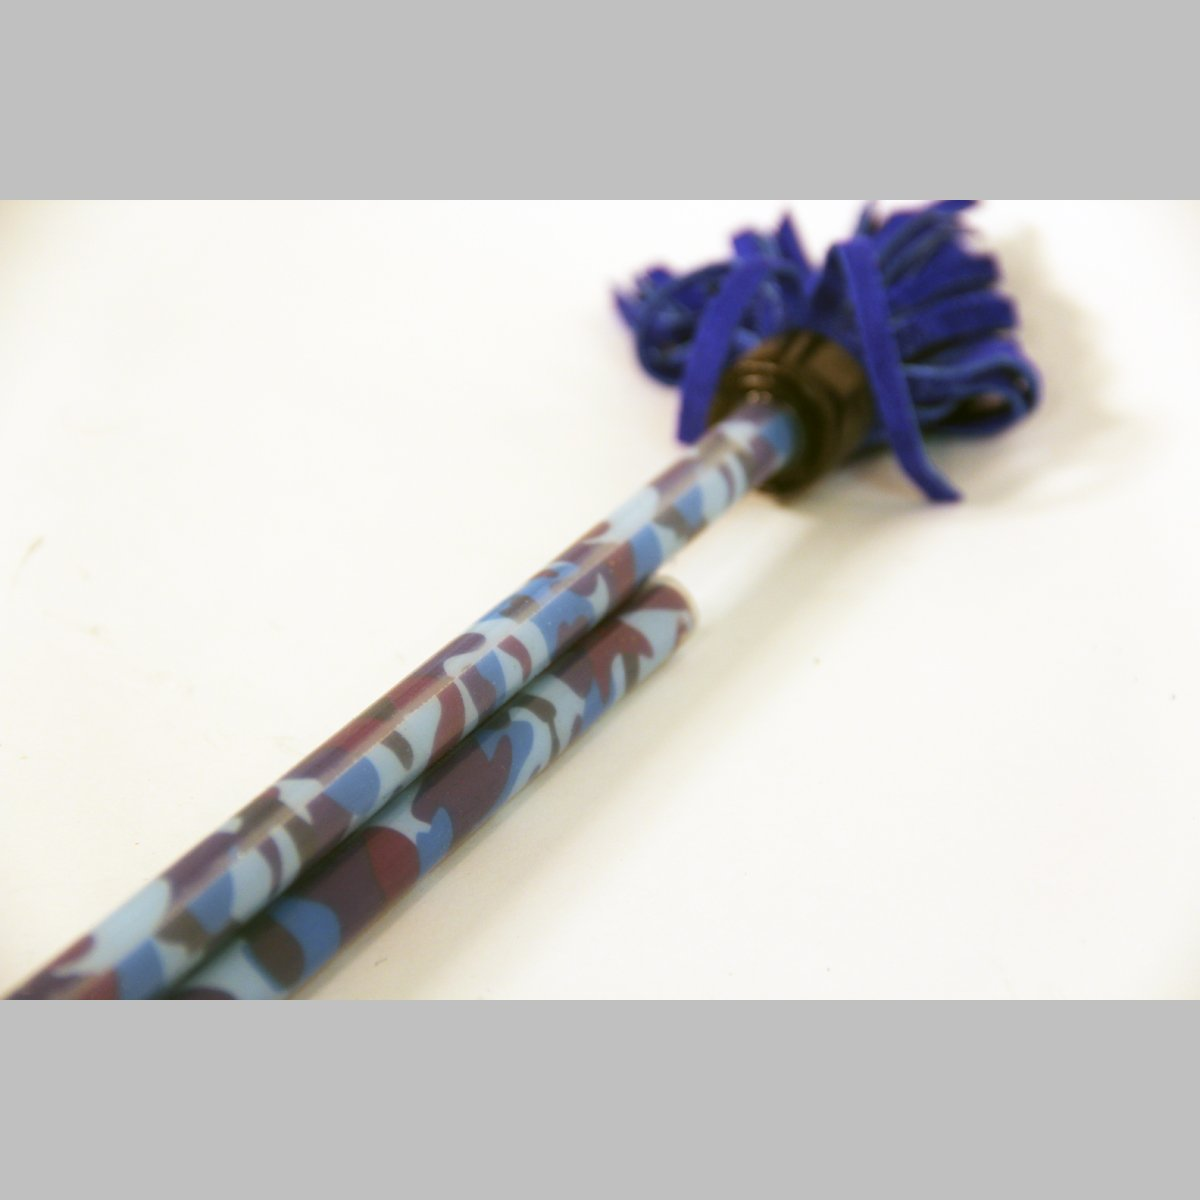 "Z-Stix Made to Order Handmade Juggling Sticks-Flower Sticks-Devil Sticks (King's Spear 30"",Blue Camo) by Z-Stix (Image #1)"